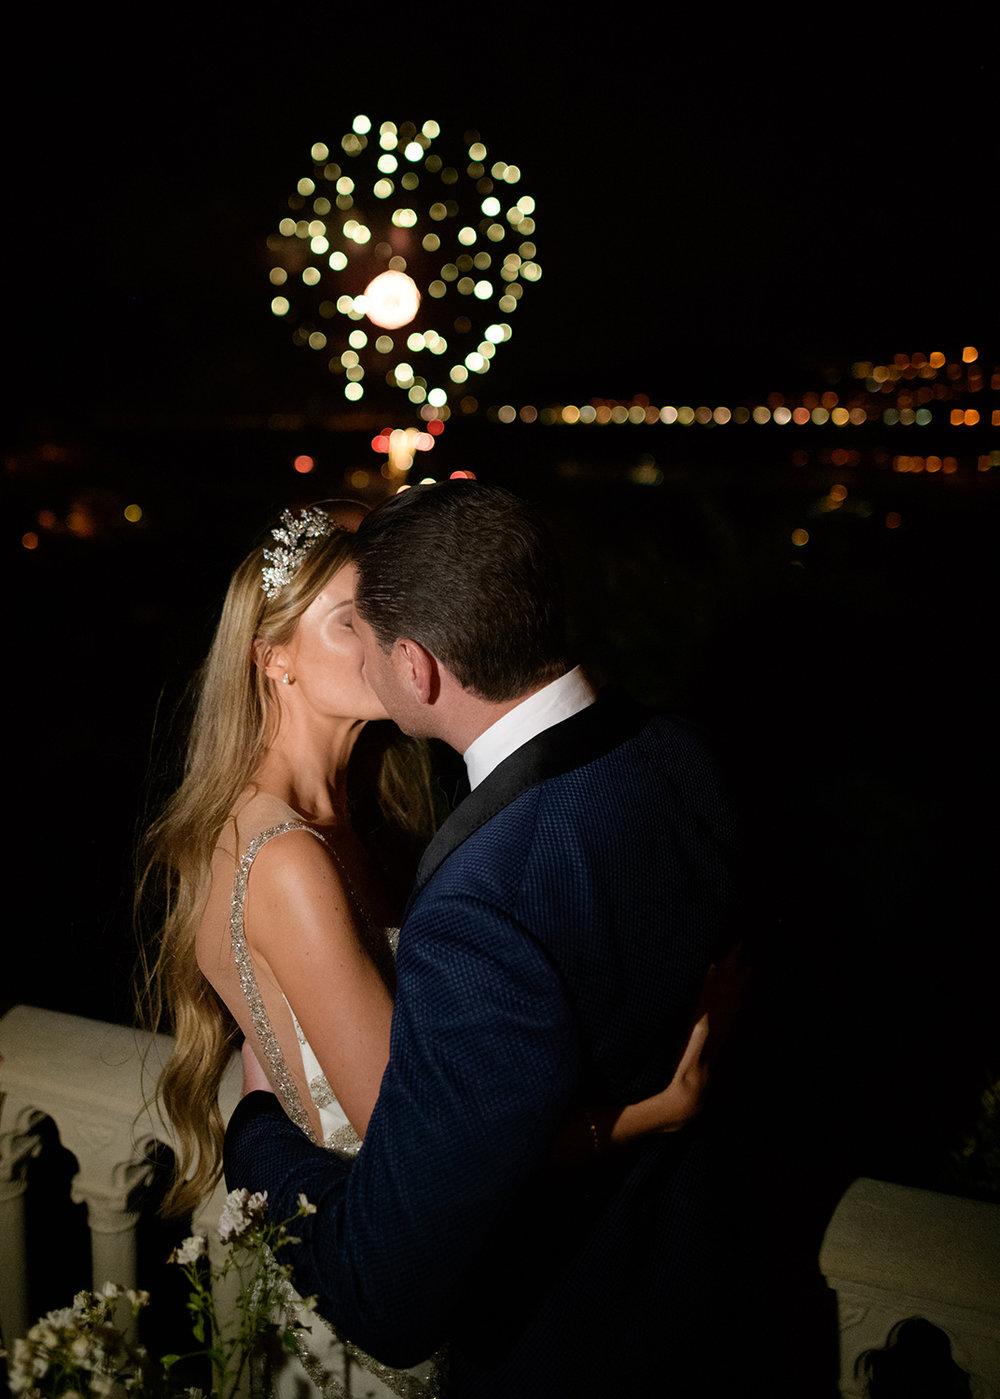 french riviera wedding photographer-F&D-©bottega53-258.JPG